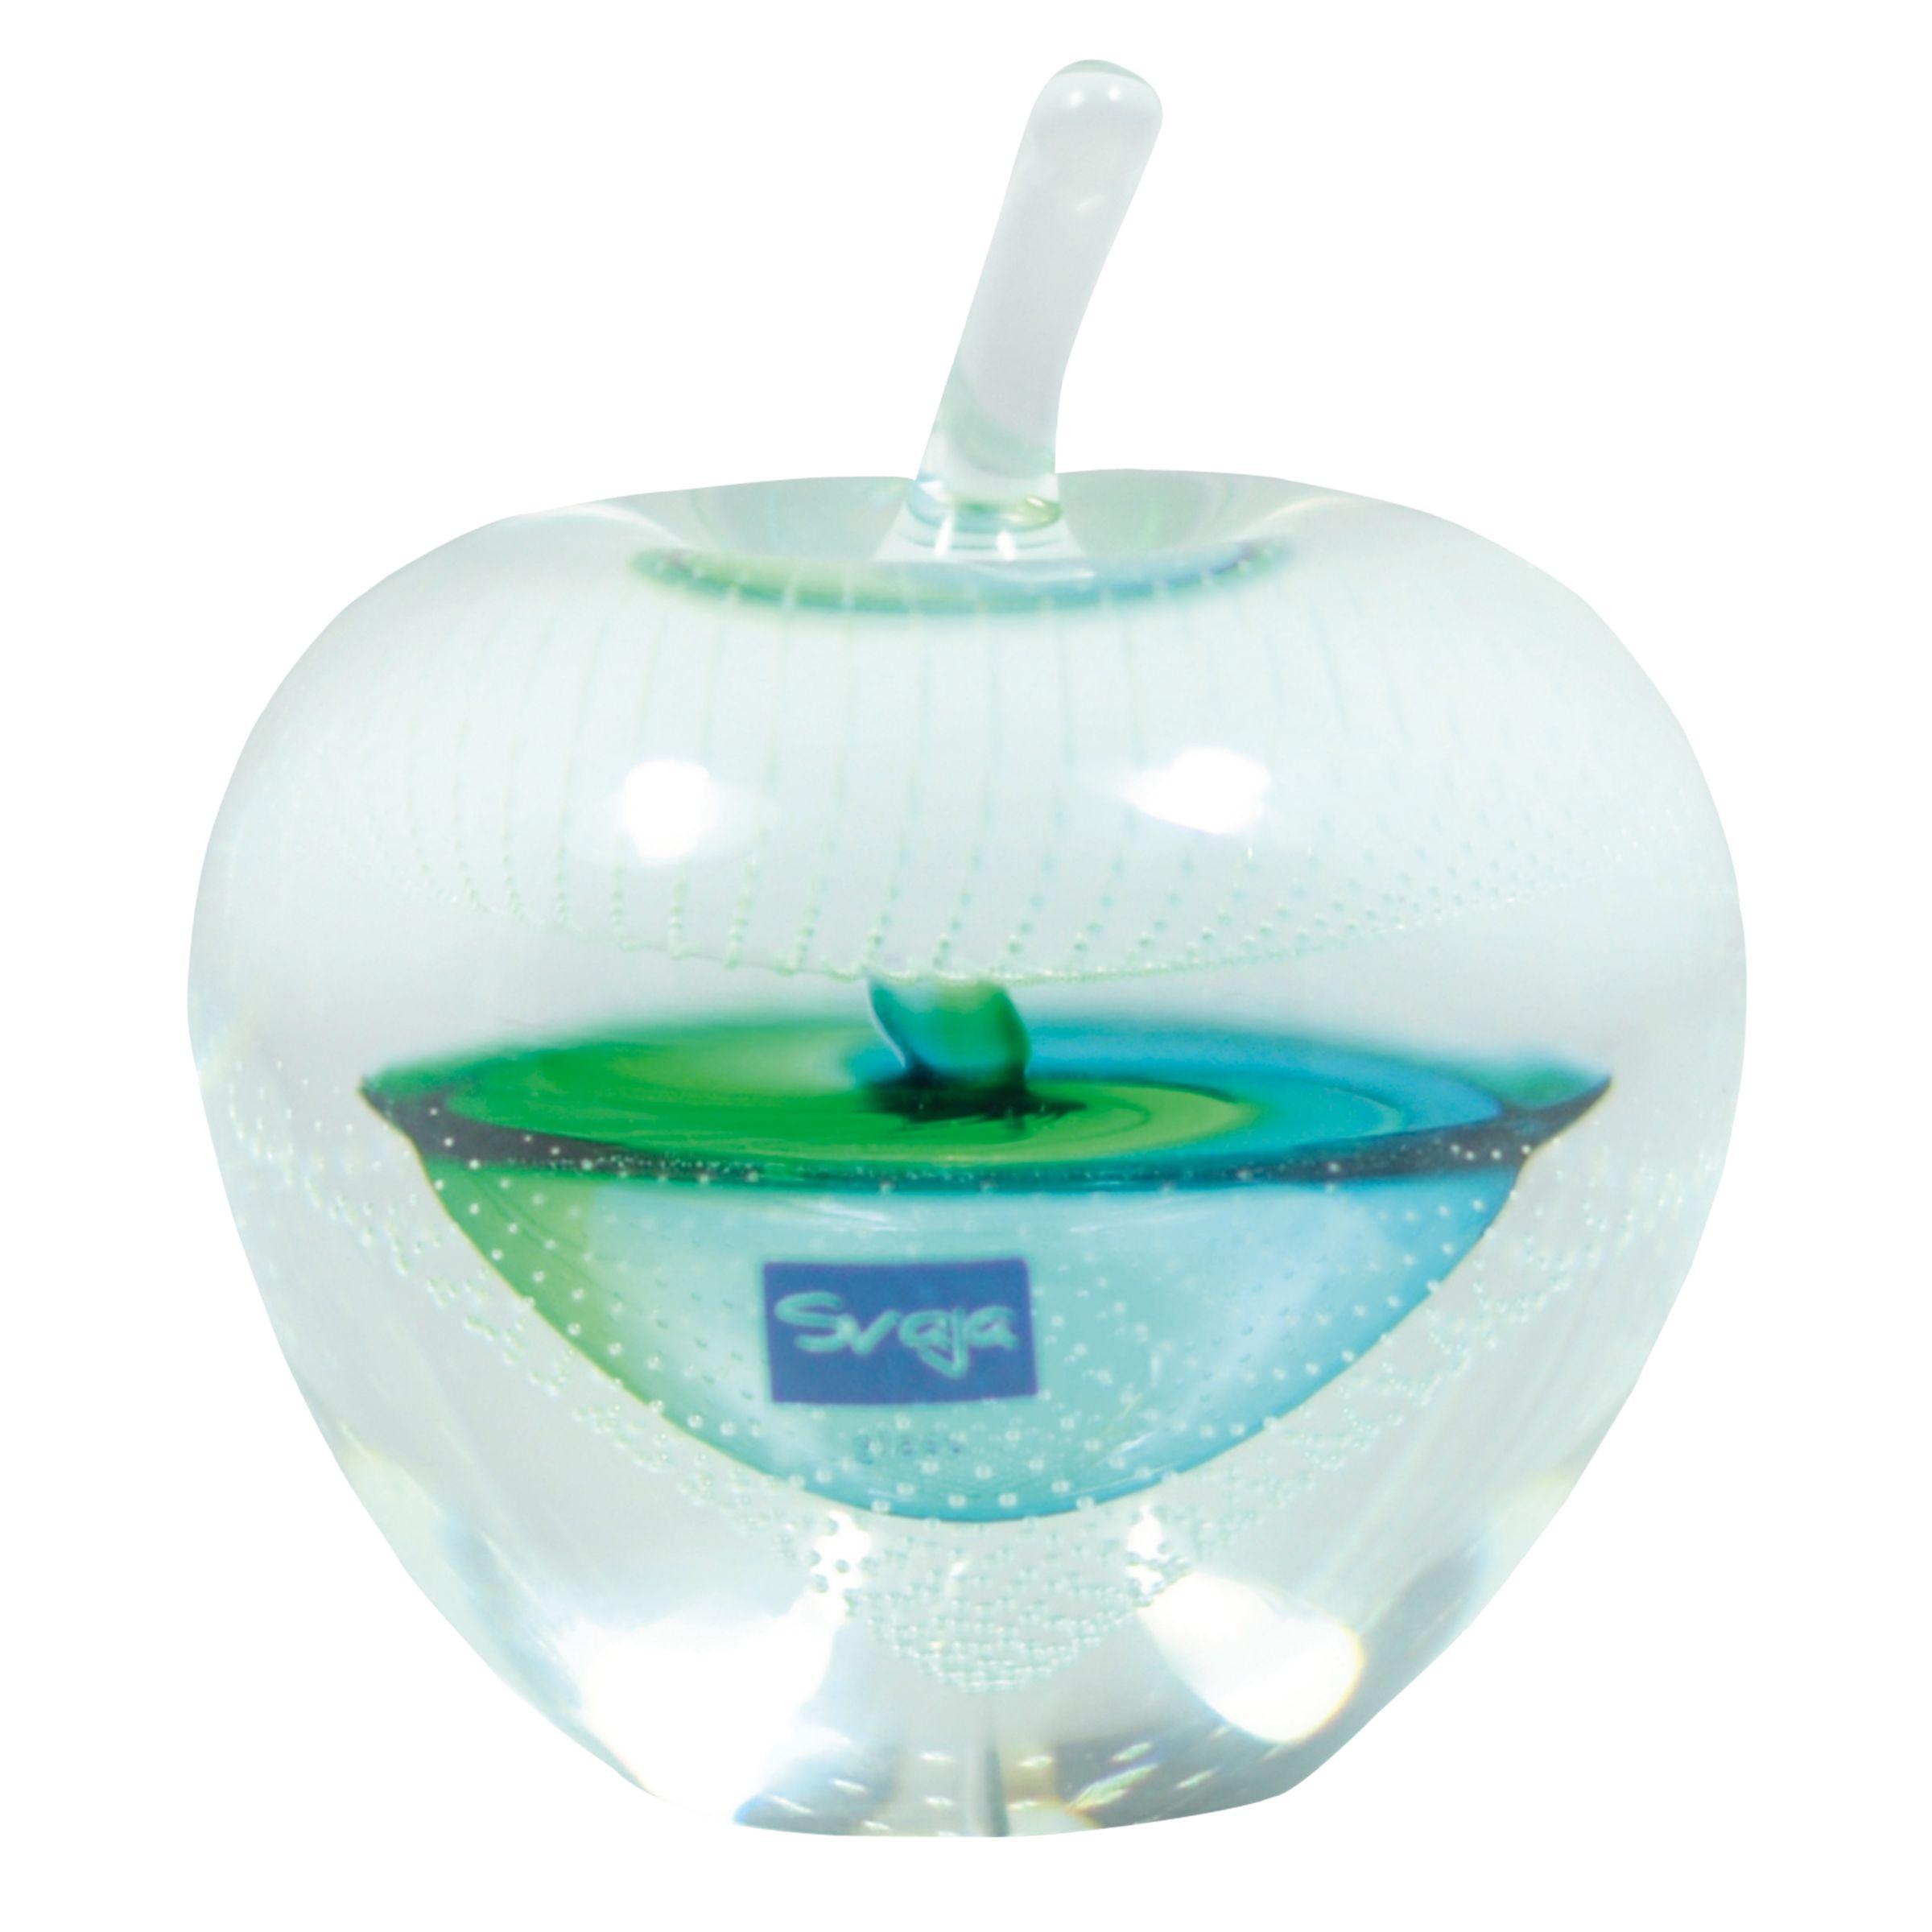 Svaja Svaja Forbidden Fruit Small Glass Ornament, Green